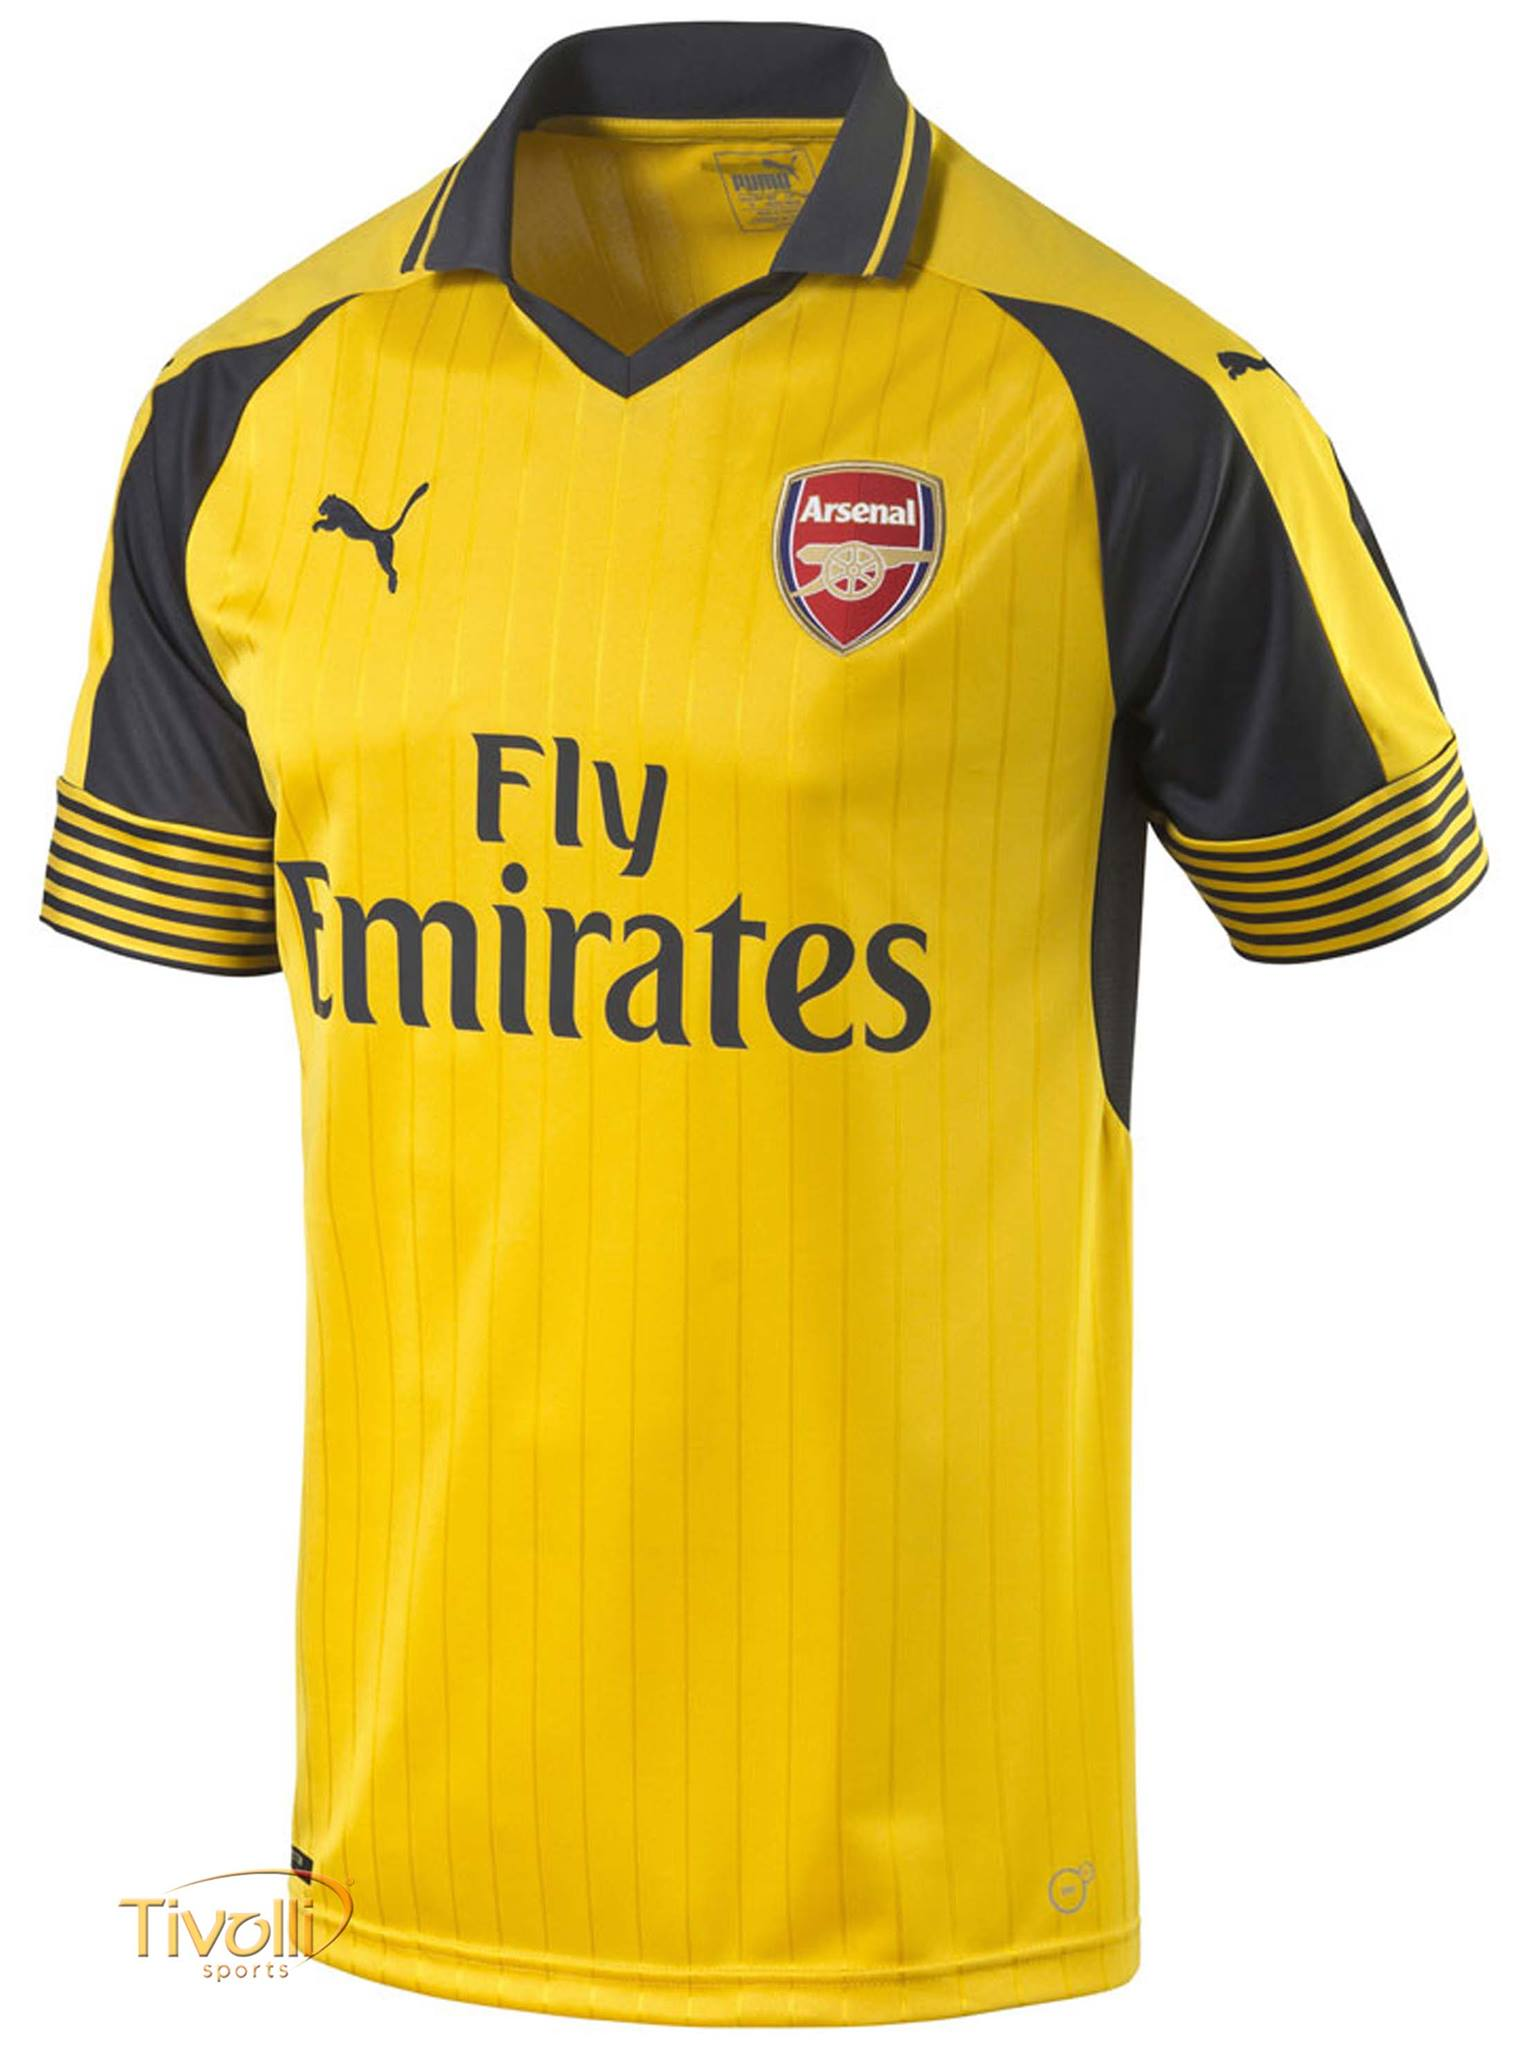 9de40475fcbcf Camisa Arsenal II Away 2016 17 Puma   - Mega Saldão